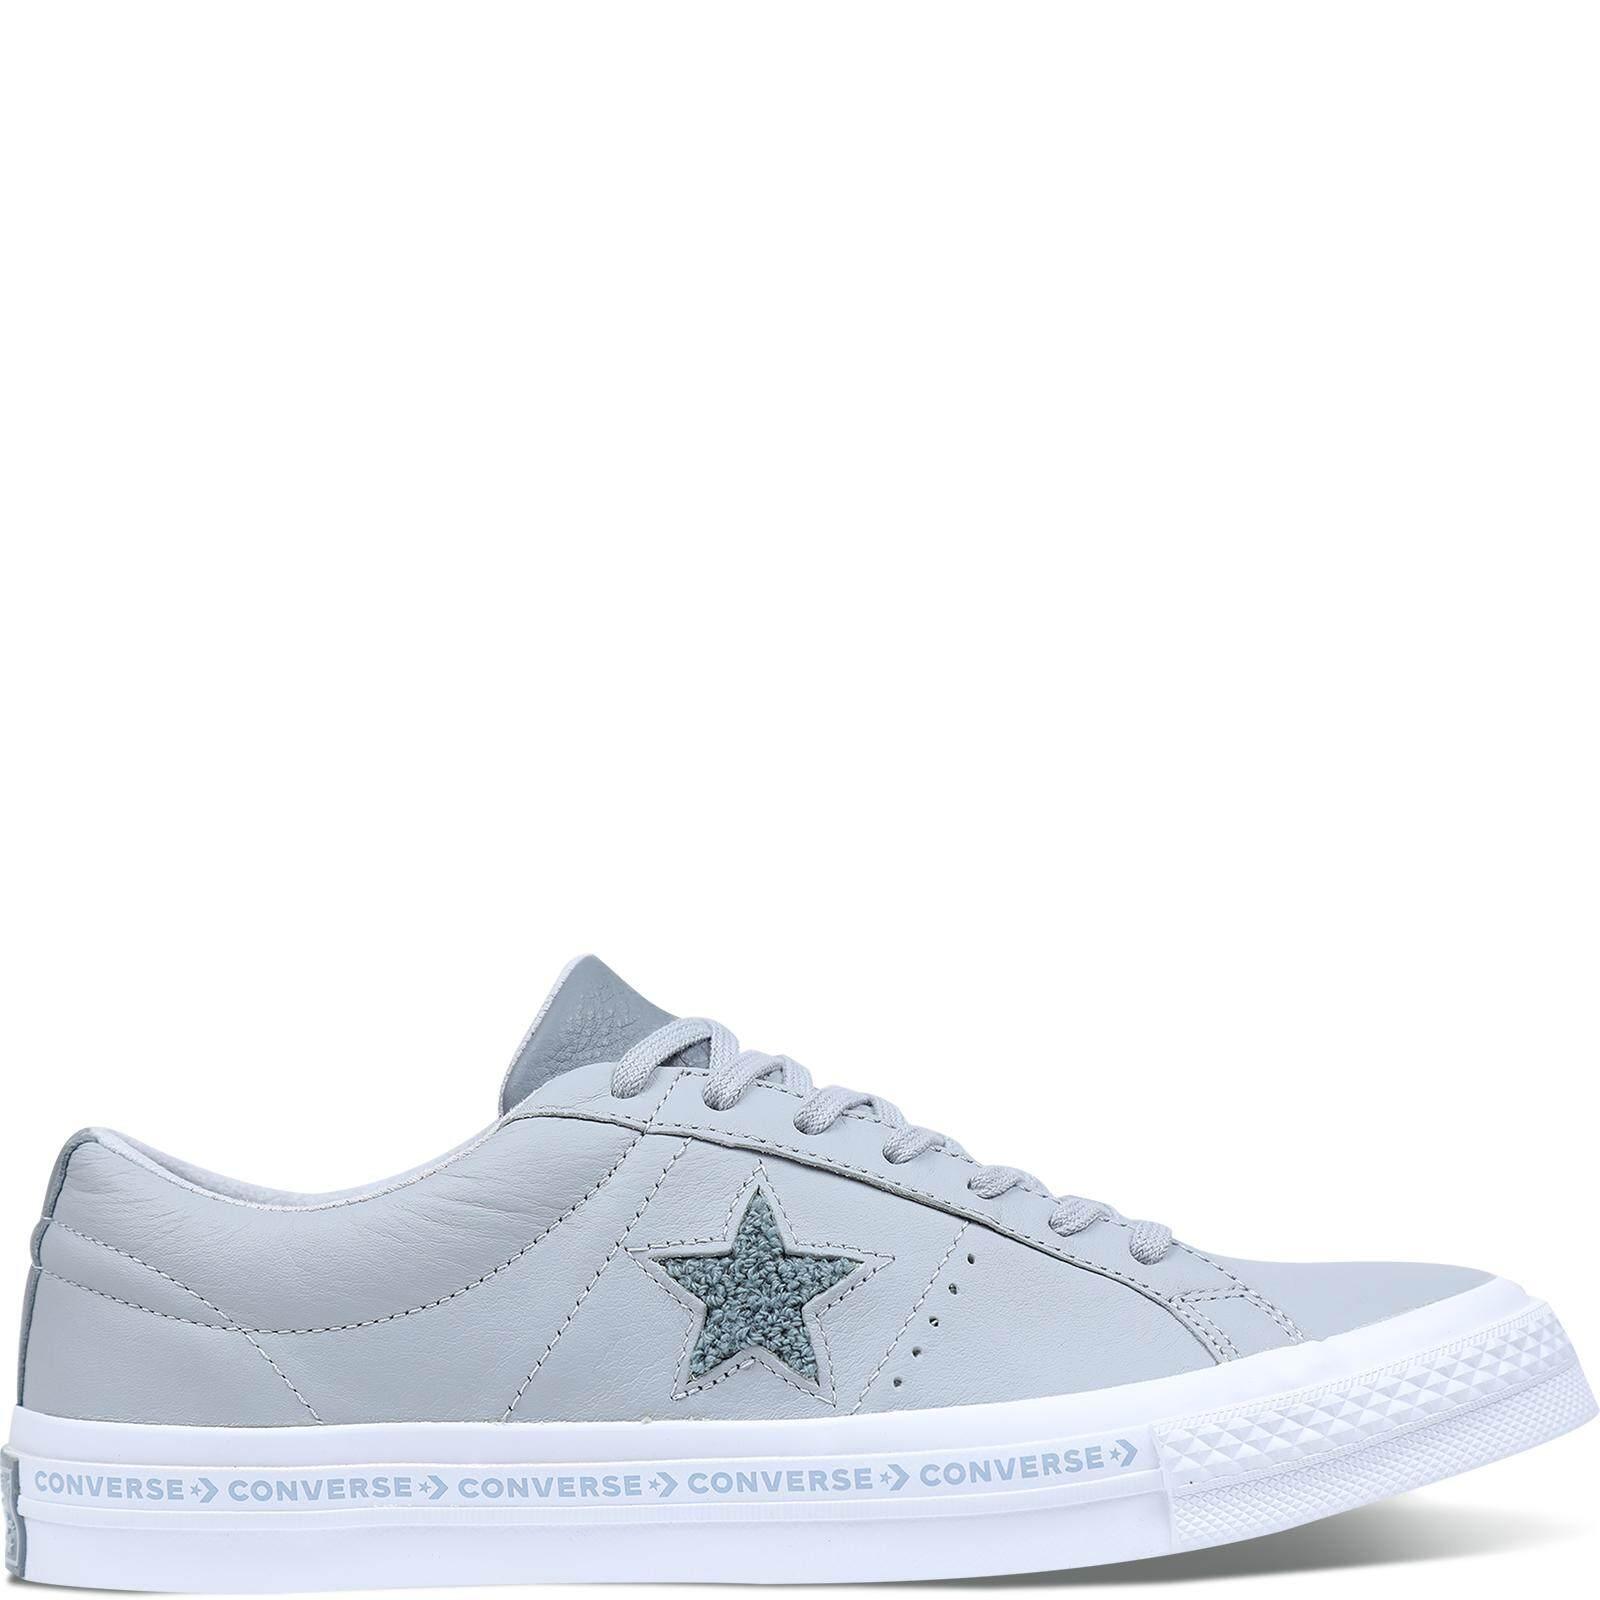 29fe715ddb77c9 Lazacar Shoes Philippines Lazada co Converse qnt671Rp